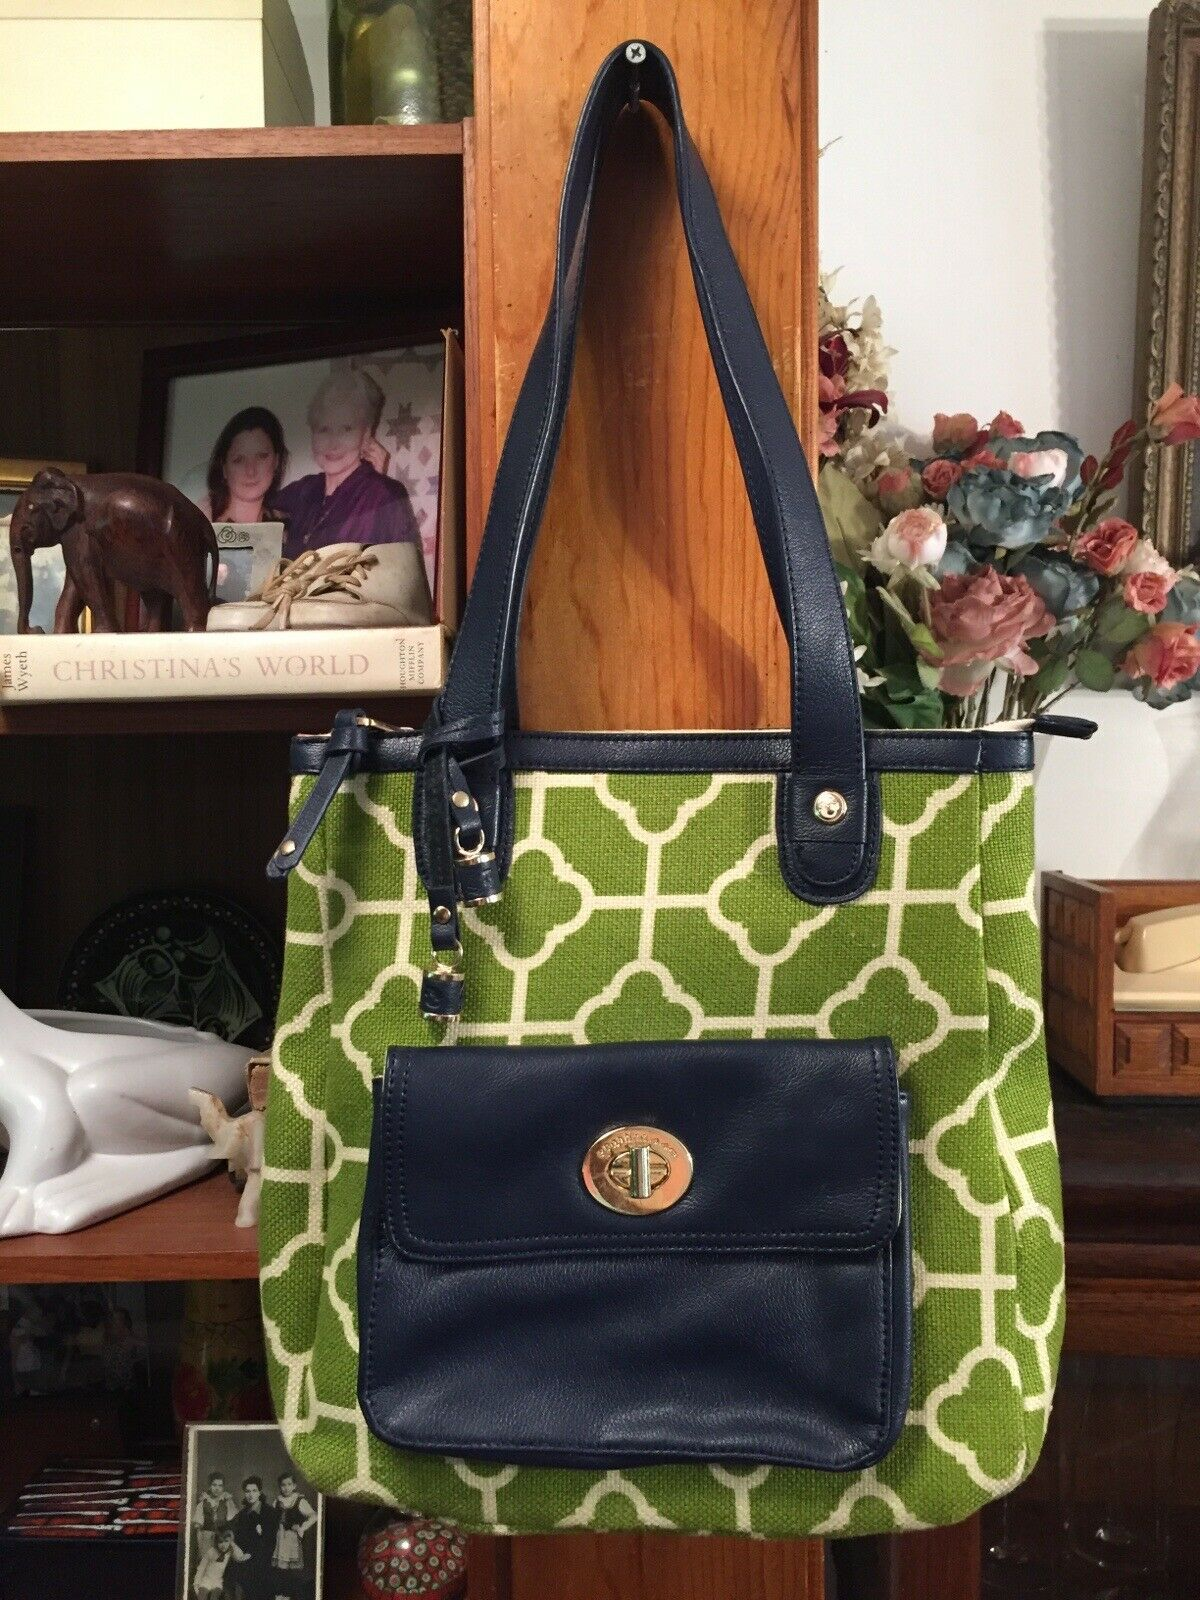 Spartina 449-Dafuskie Island Purse Handbag Lime green Navy blue Natural linen